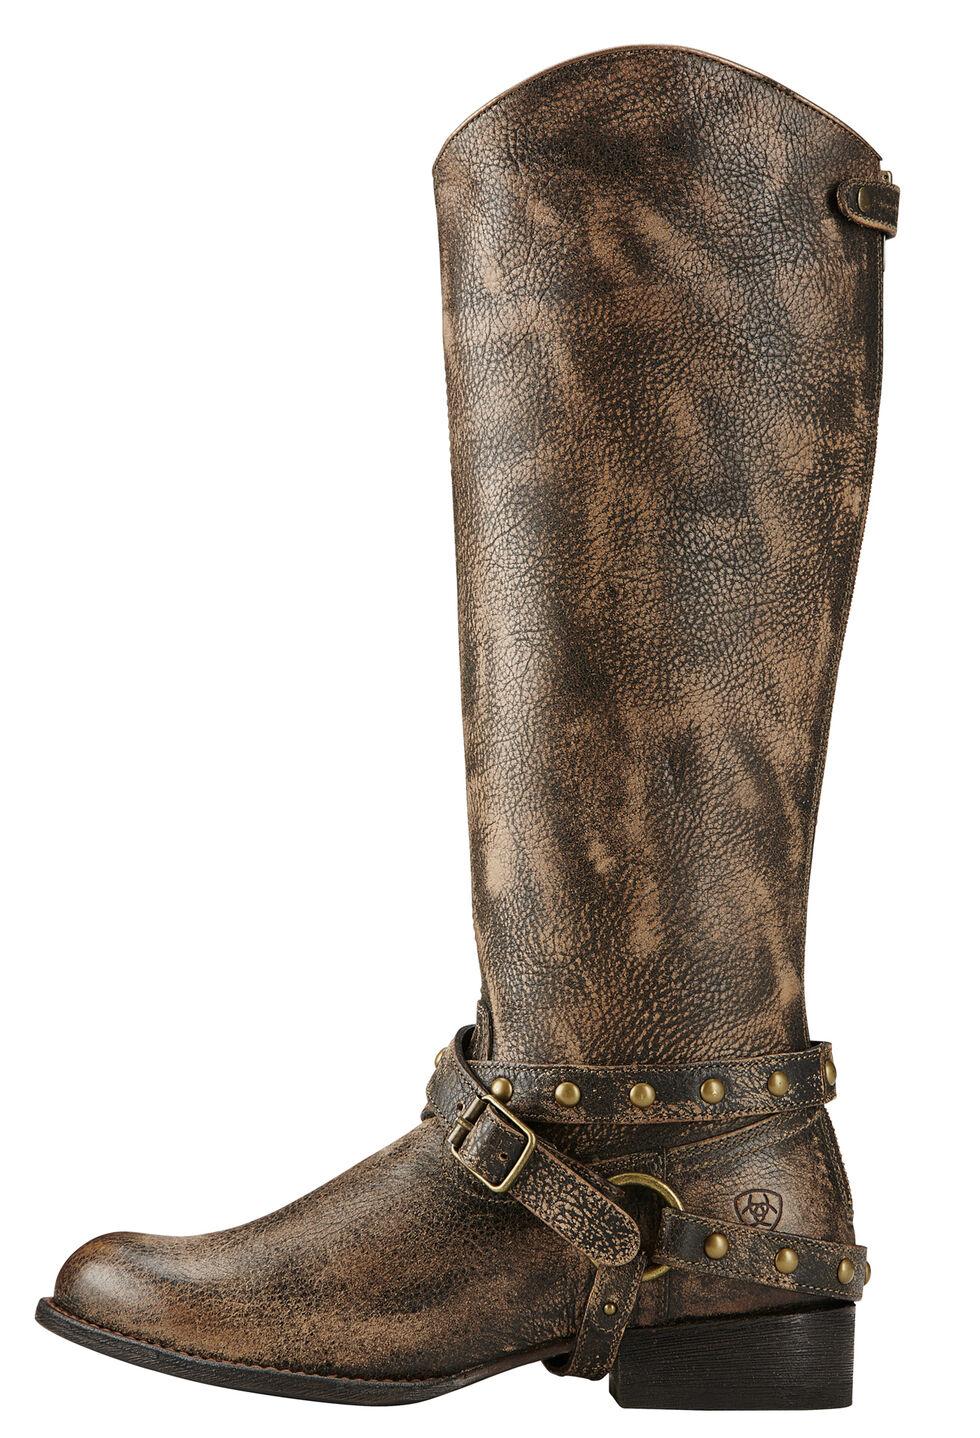 Ariat Brooklyn Brown Manhattan Fashion Cowgirl Boots - Round Toe , Brown, hi-res